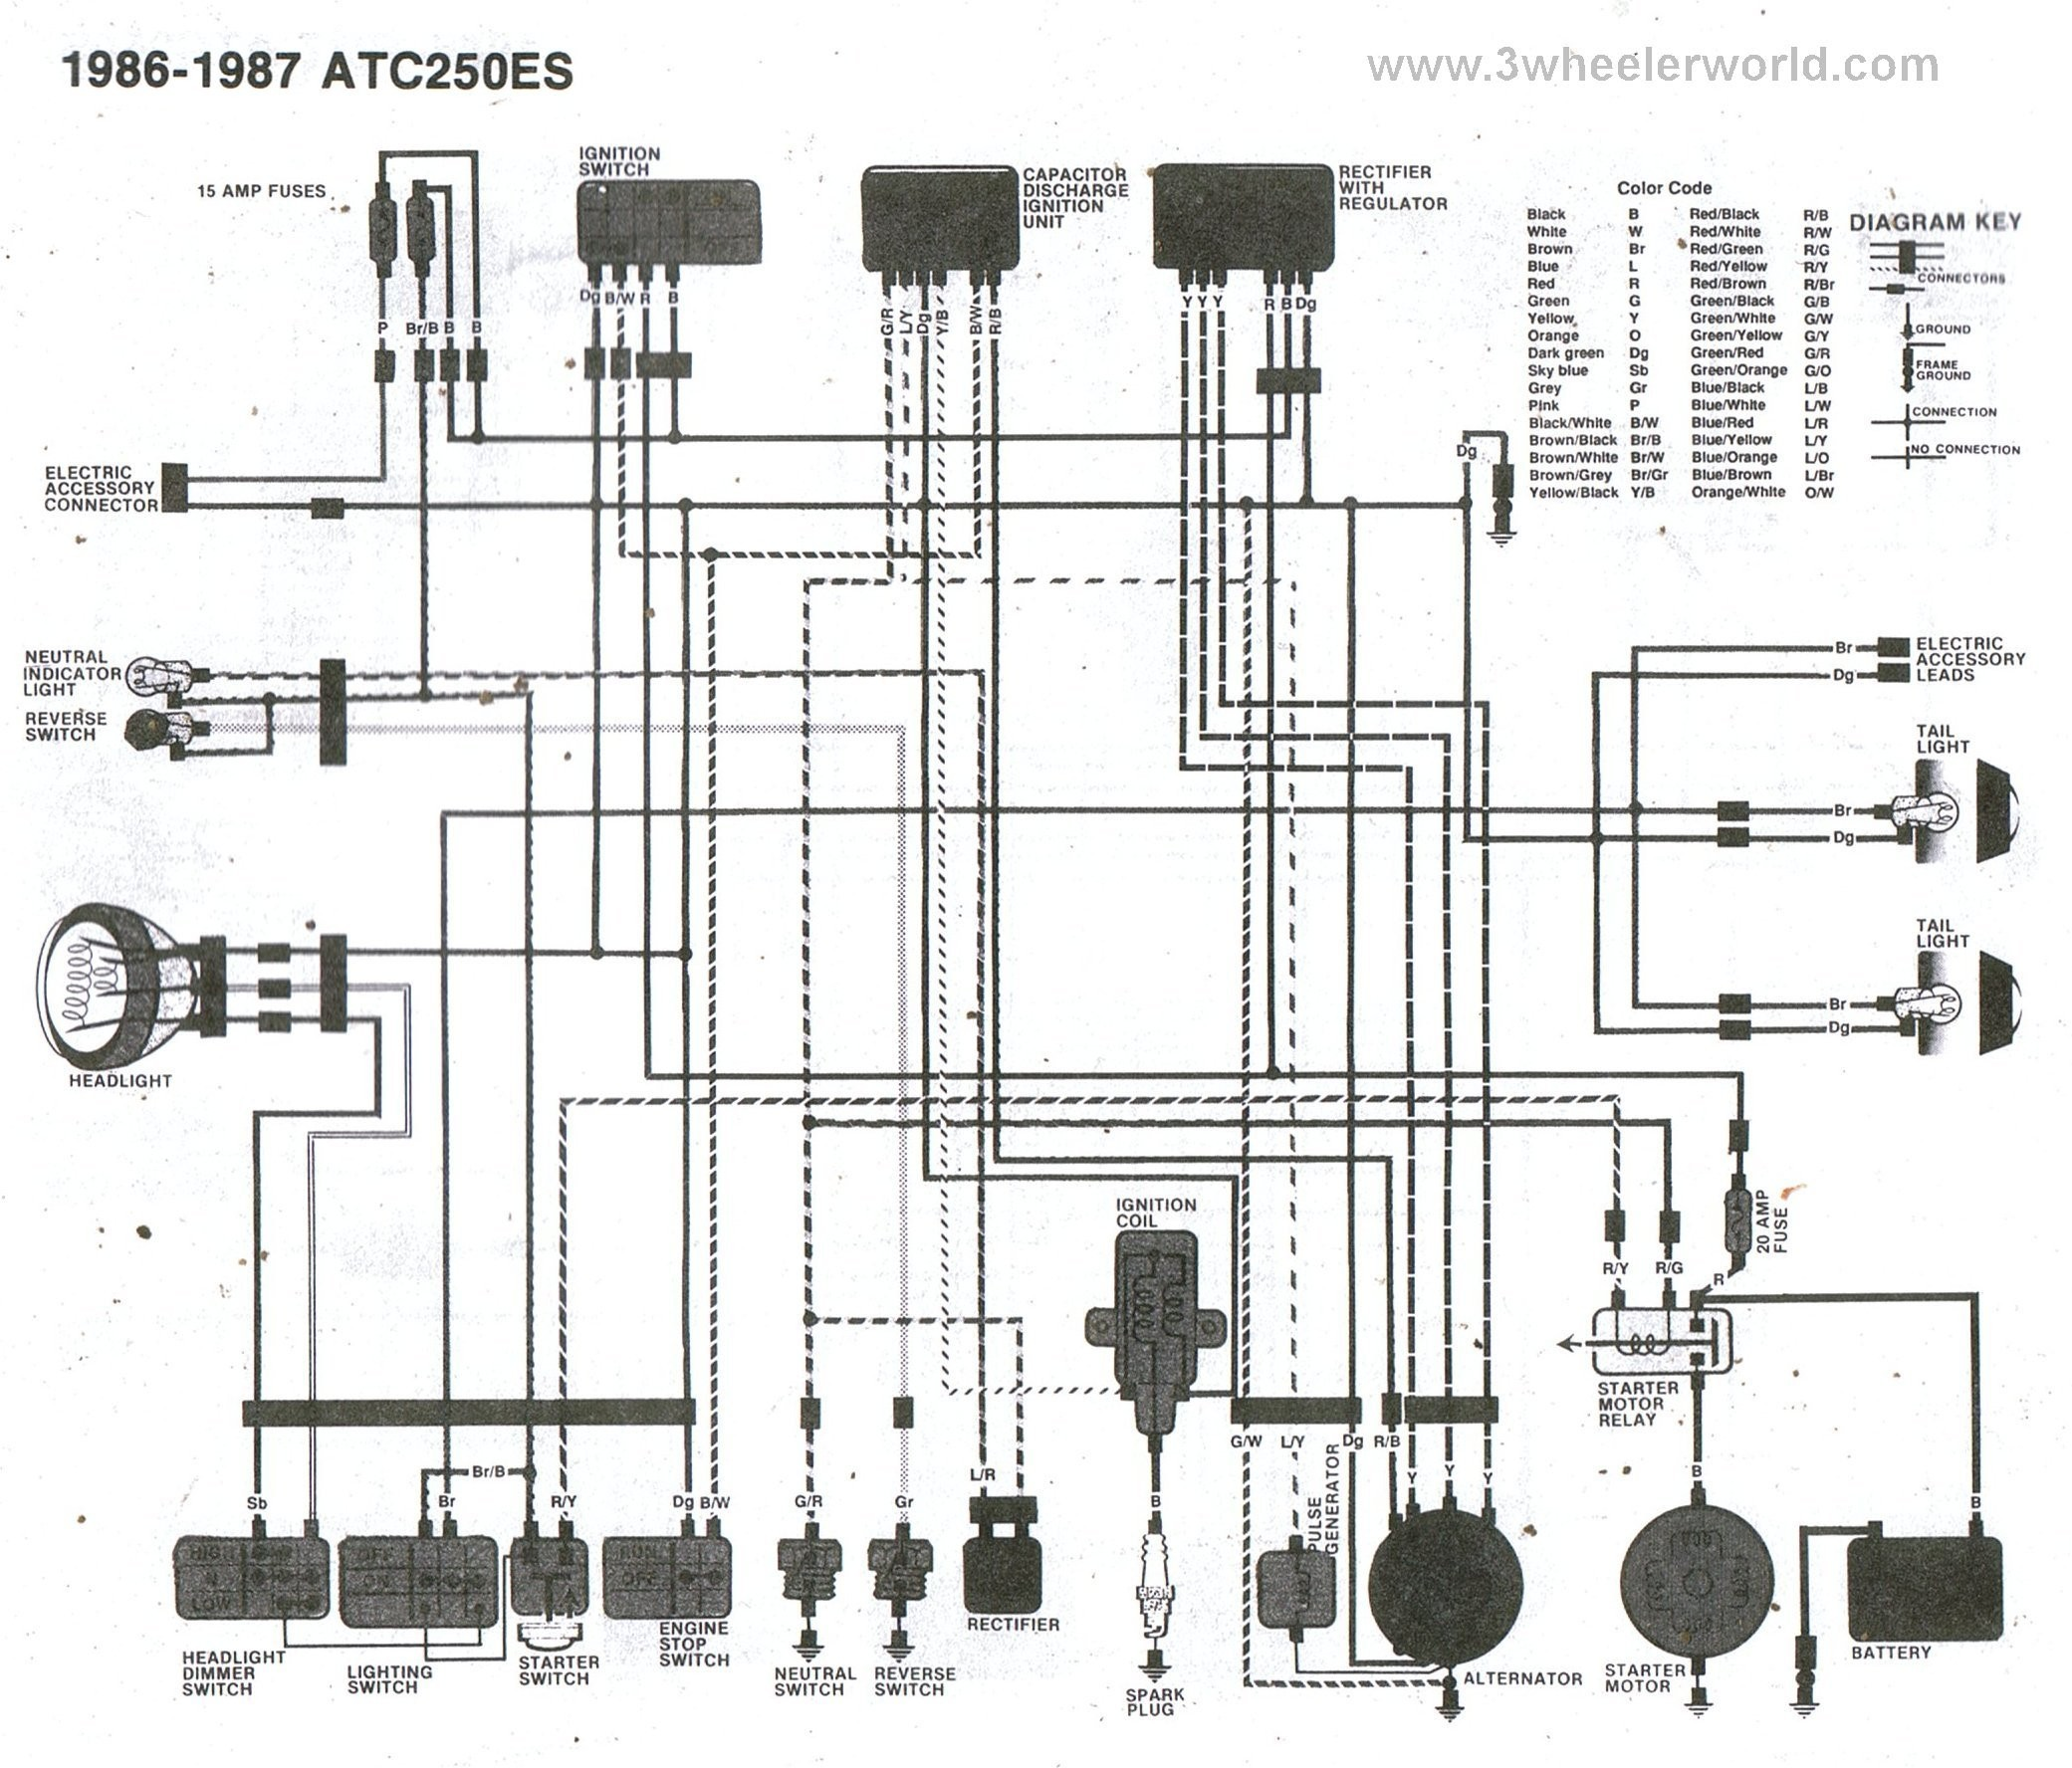 2000 Trx400ex Wiring Diagram